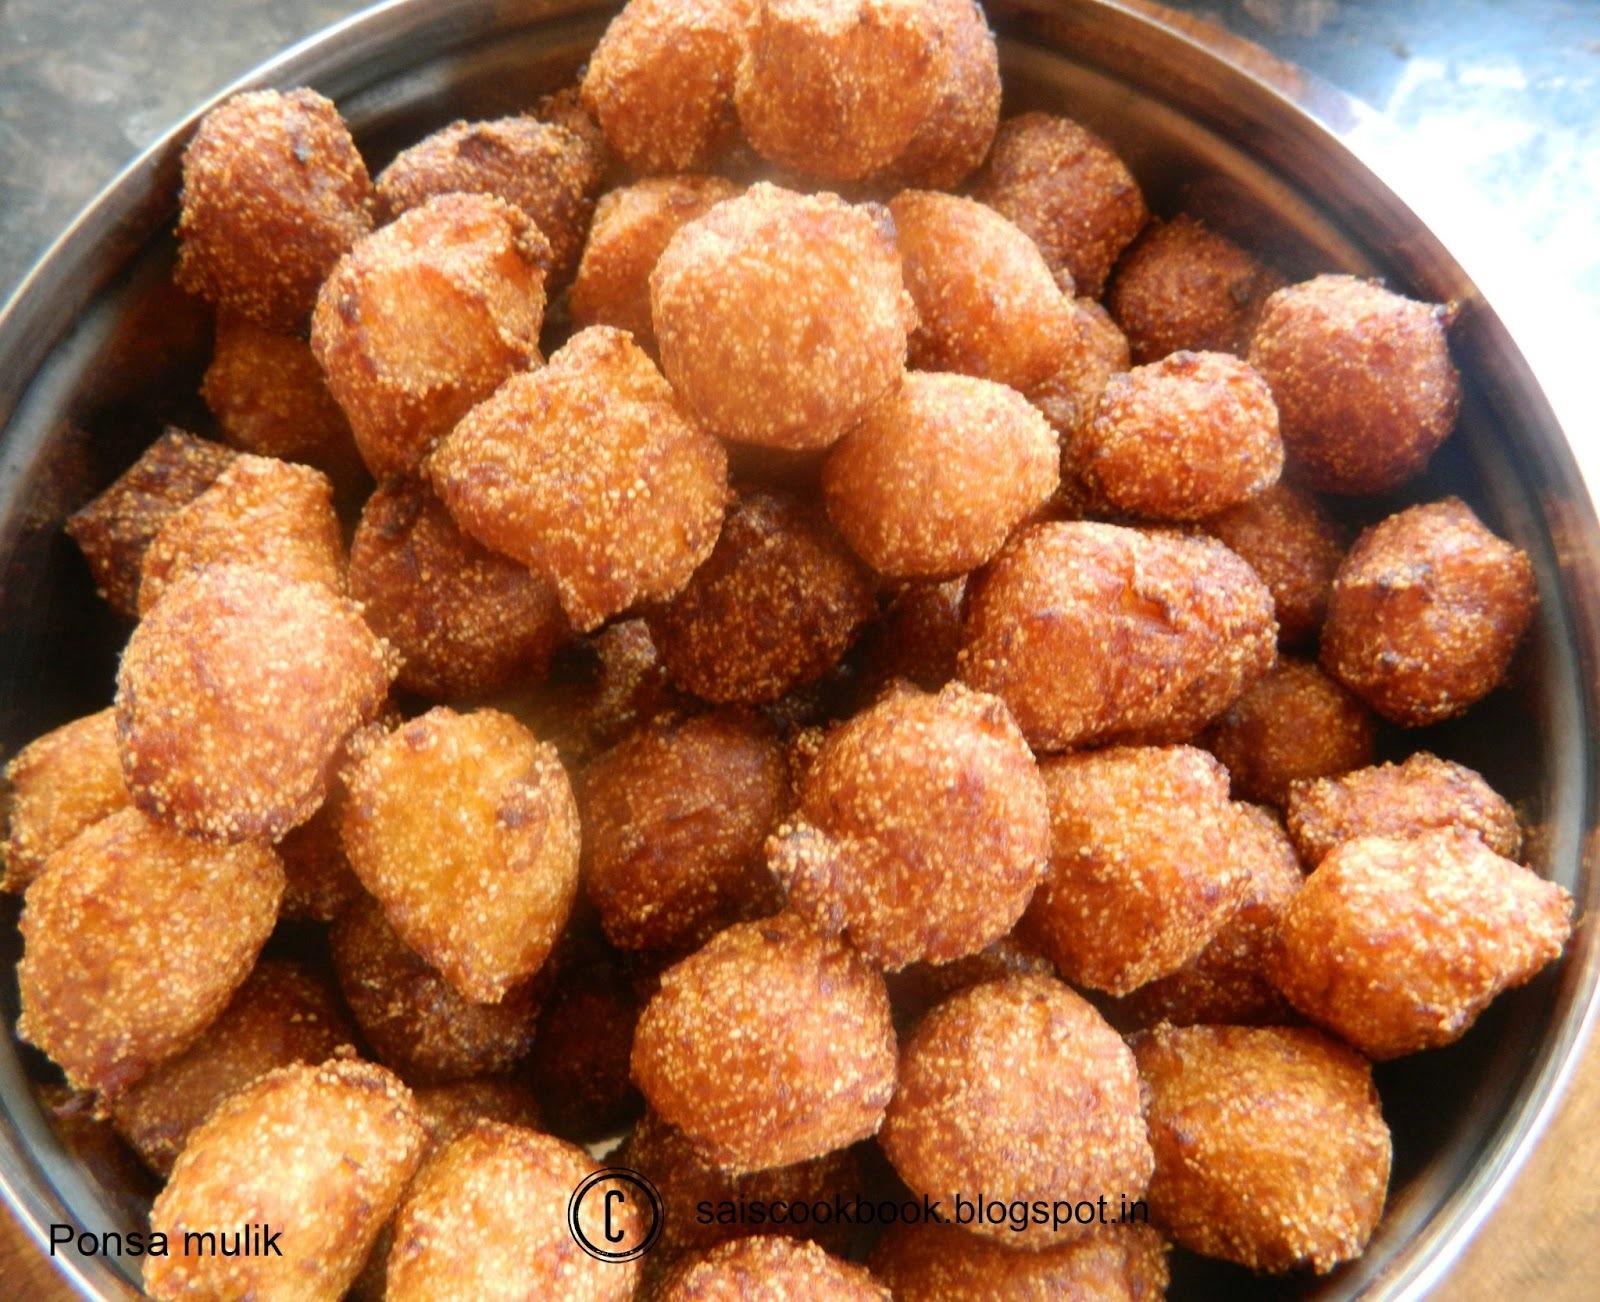 Phonsa Mulik/Jackfruit fritters and my 300th post